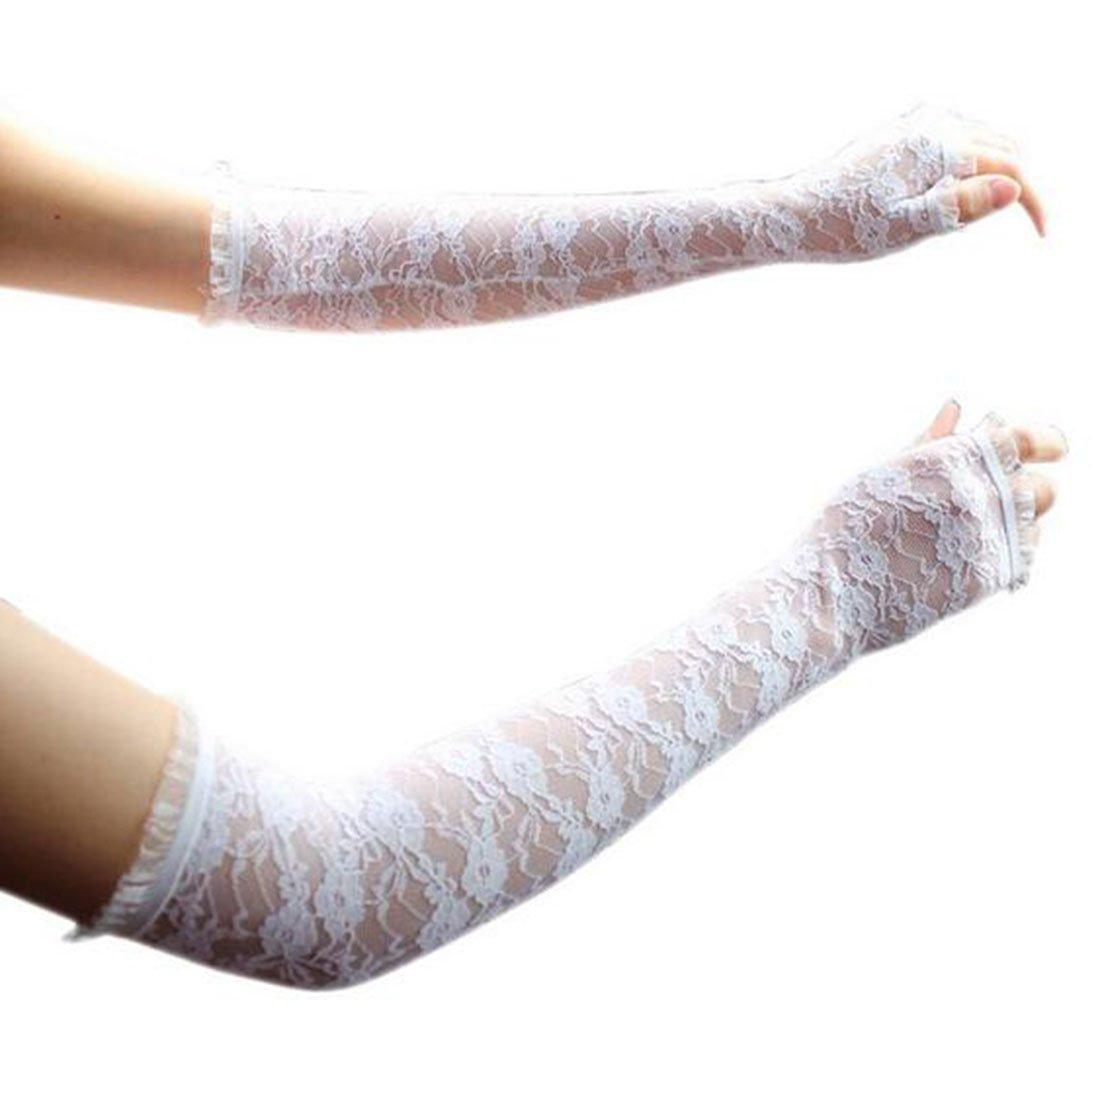 1Pair Women's Summer Sunscreen Thin Long UV Blocking Half Finger Lace Gloves? White DUFU160746